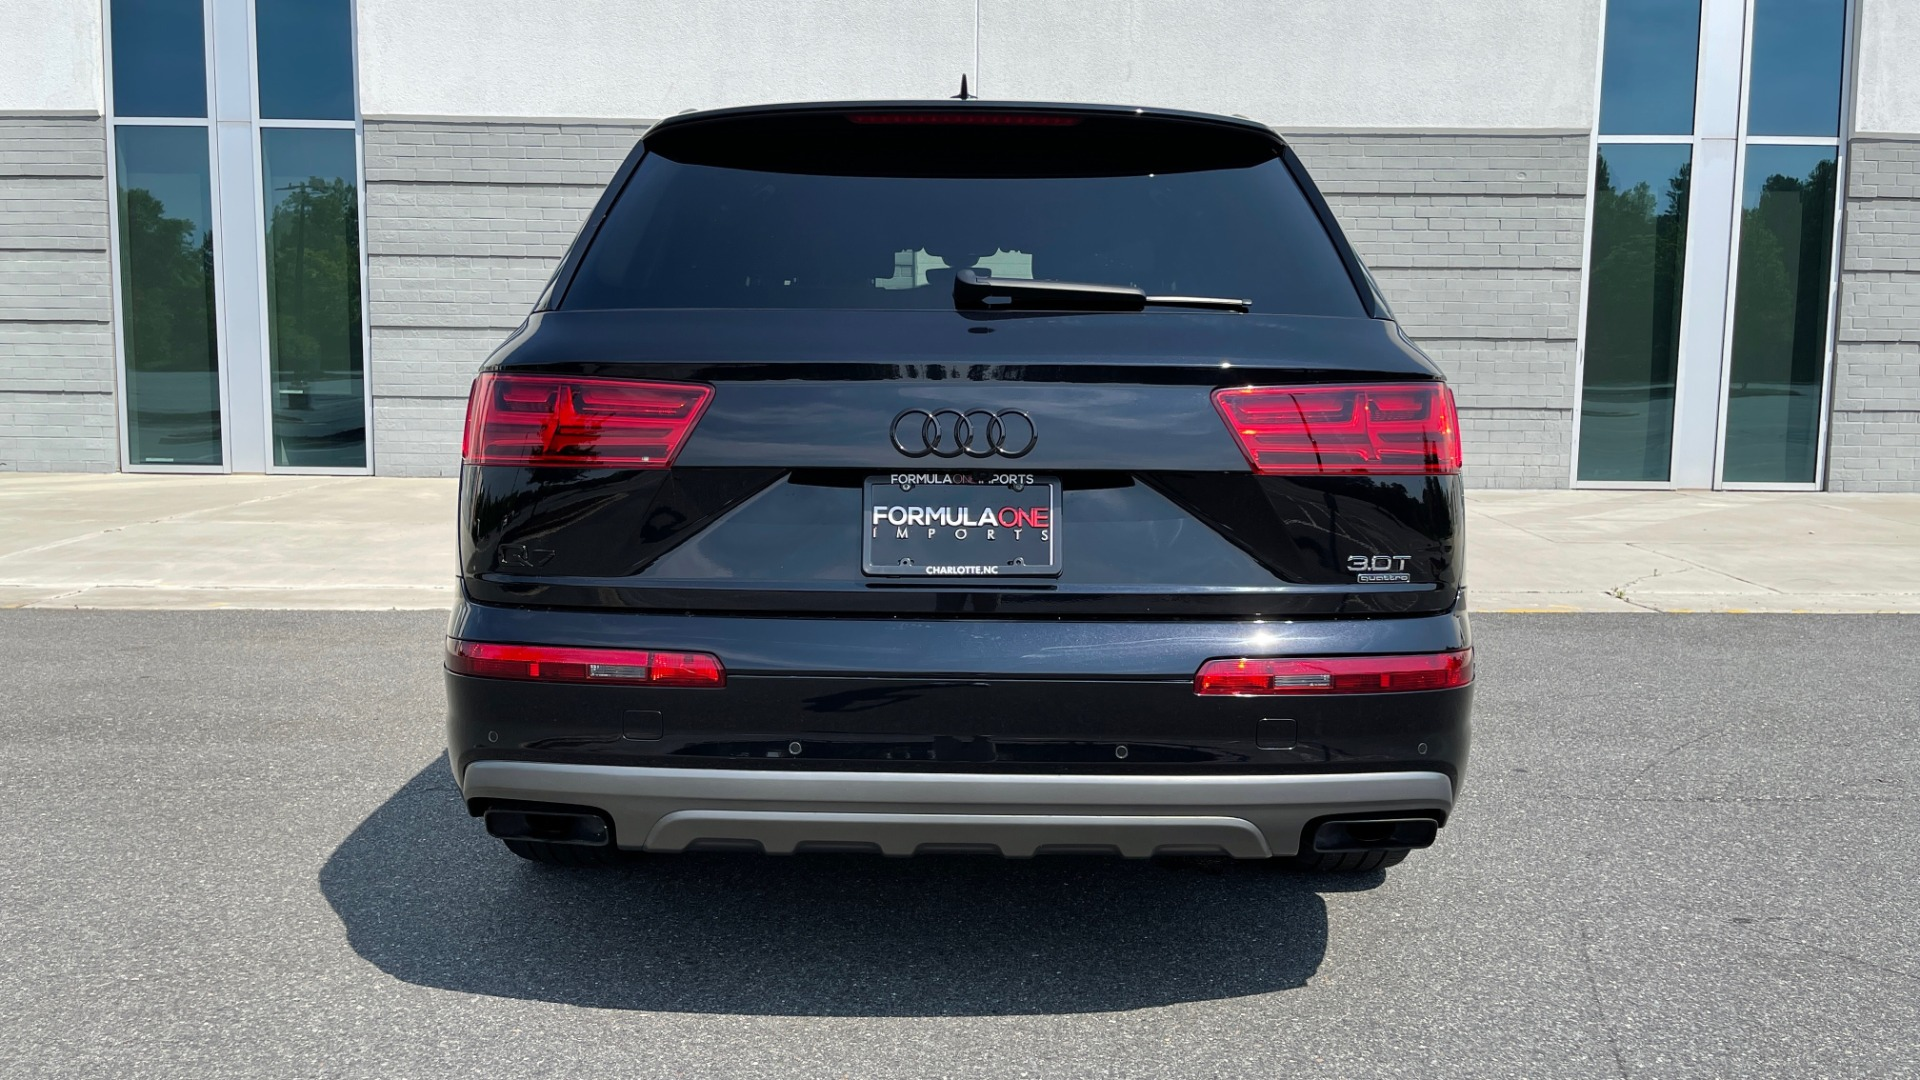 Used 2018 Audi Q7 PRESTIGE TIPTRONIC / NAV / SUNROOF / ADAPTIVE PKG / DRVR ASST / CLD WTHR /  for sale $49,995 at Formula Imports in Charlotte NC 28227 24